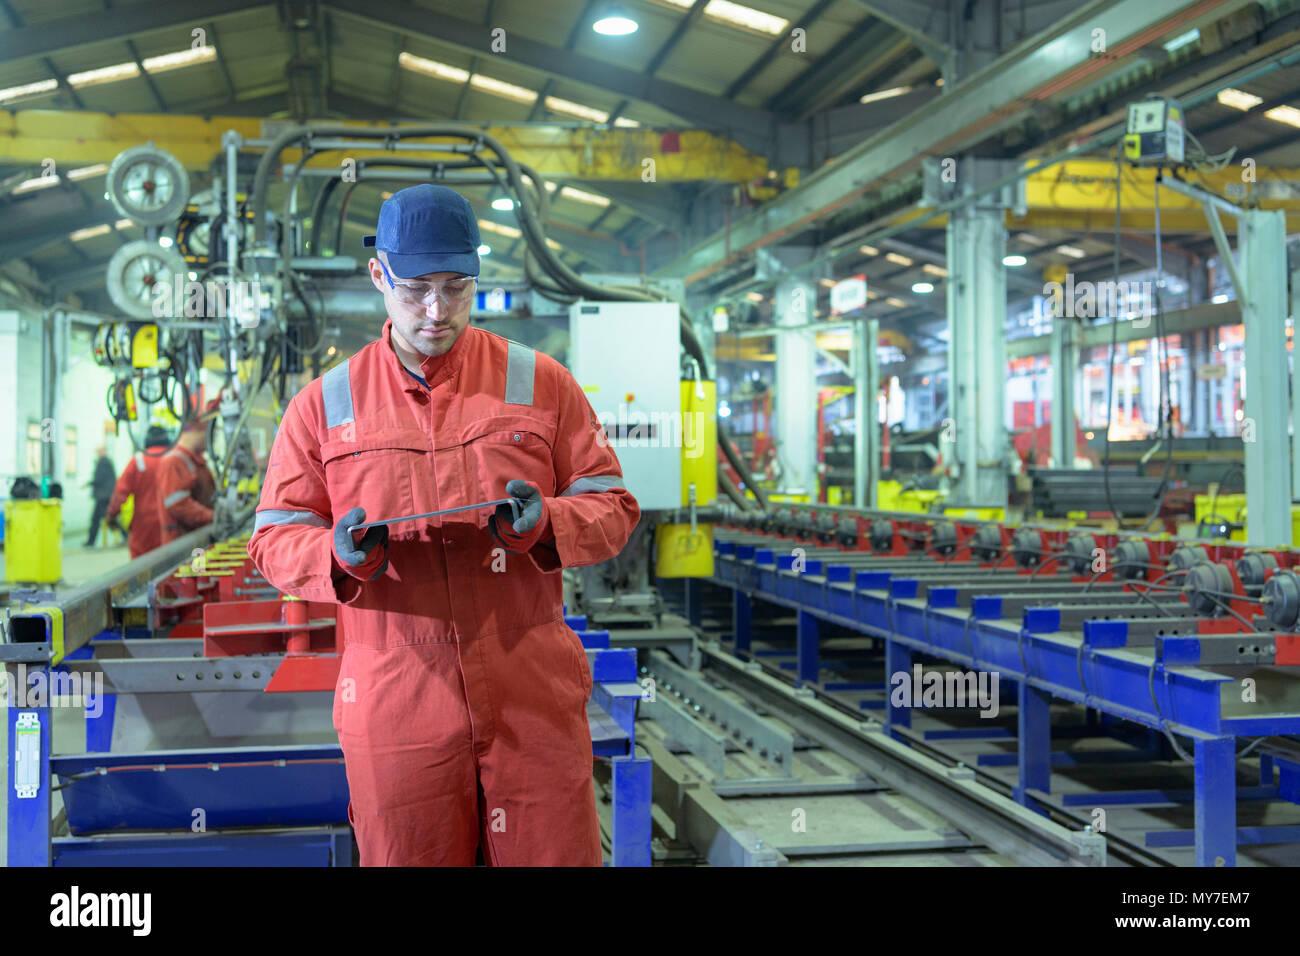 Portrait of worker inspecting metal part in trailer factory - Stock Image